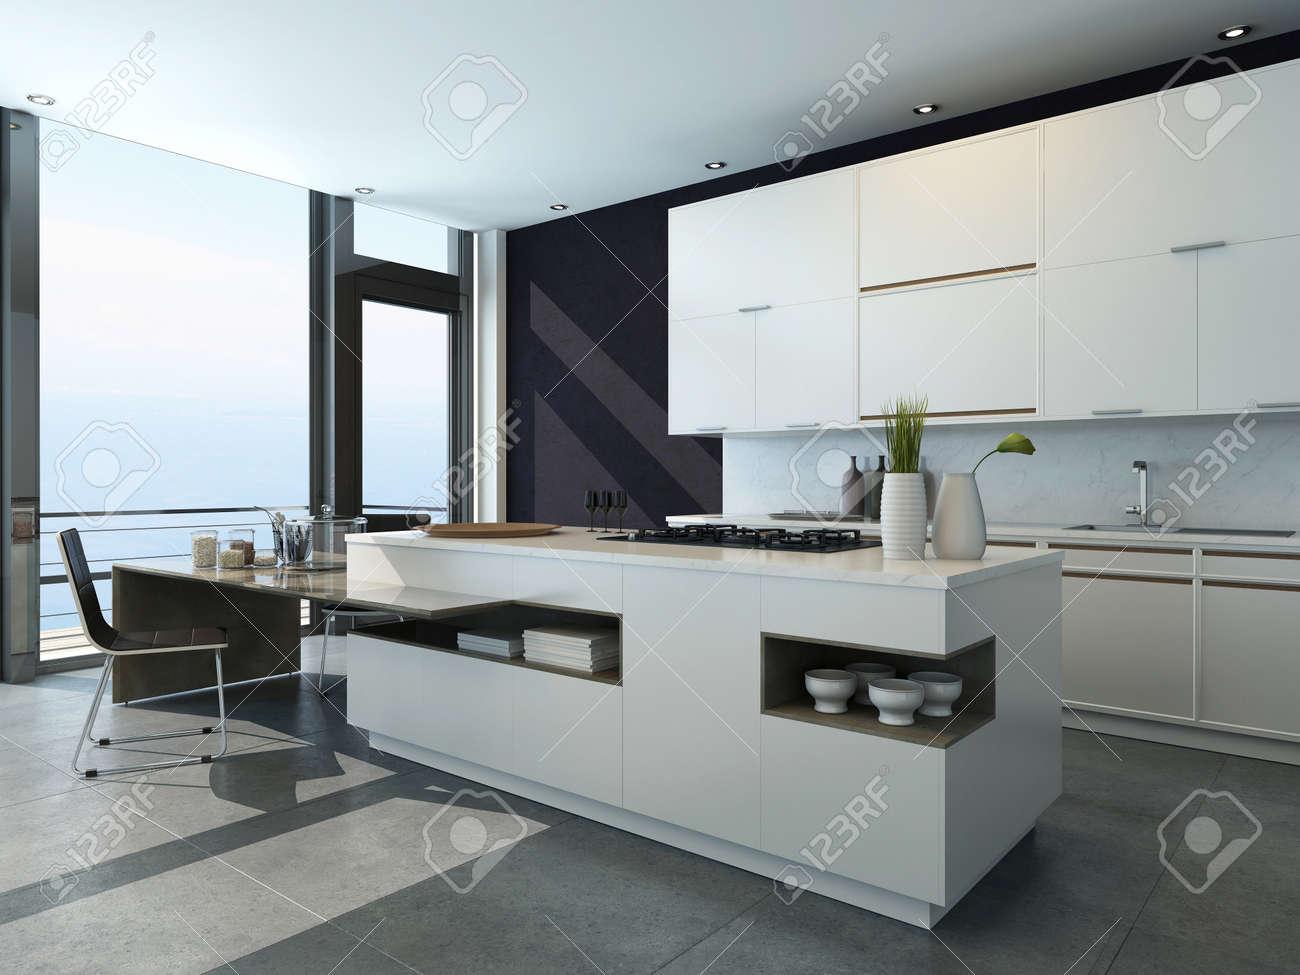 Schwarz Weiss Kuche Interieur Mit Modernen Mobeln Lizenzfreie Fotos